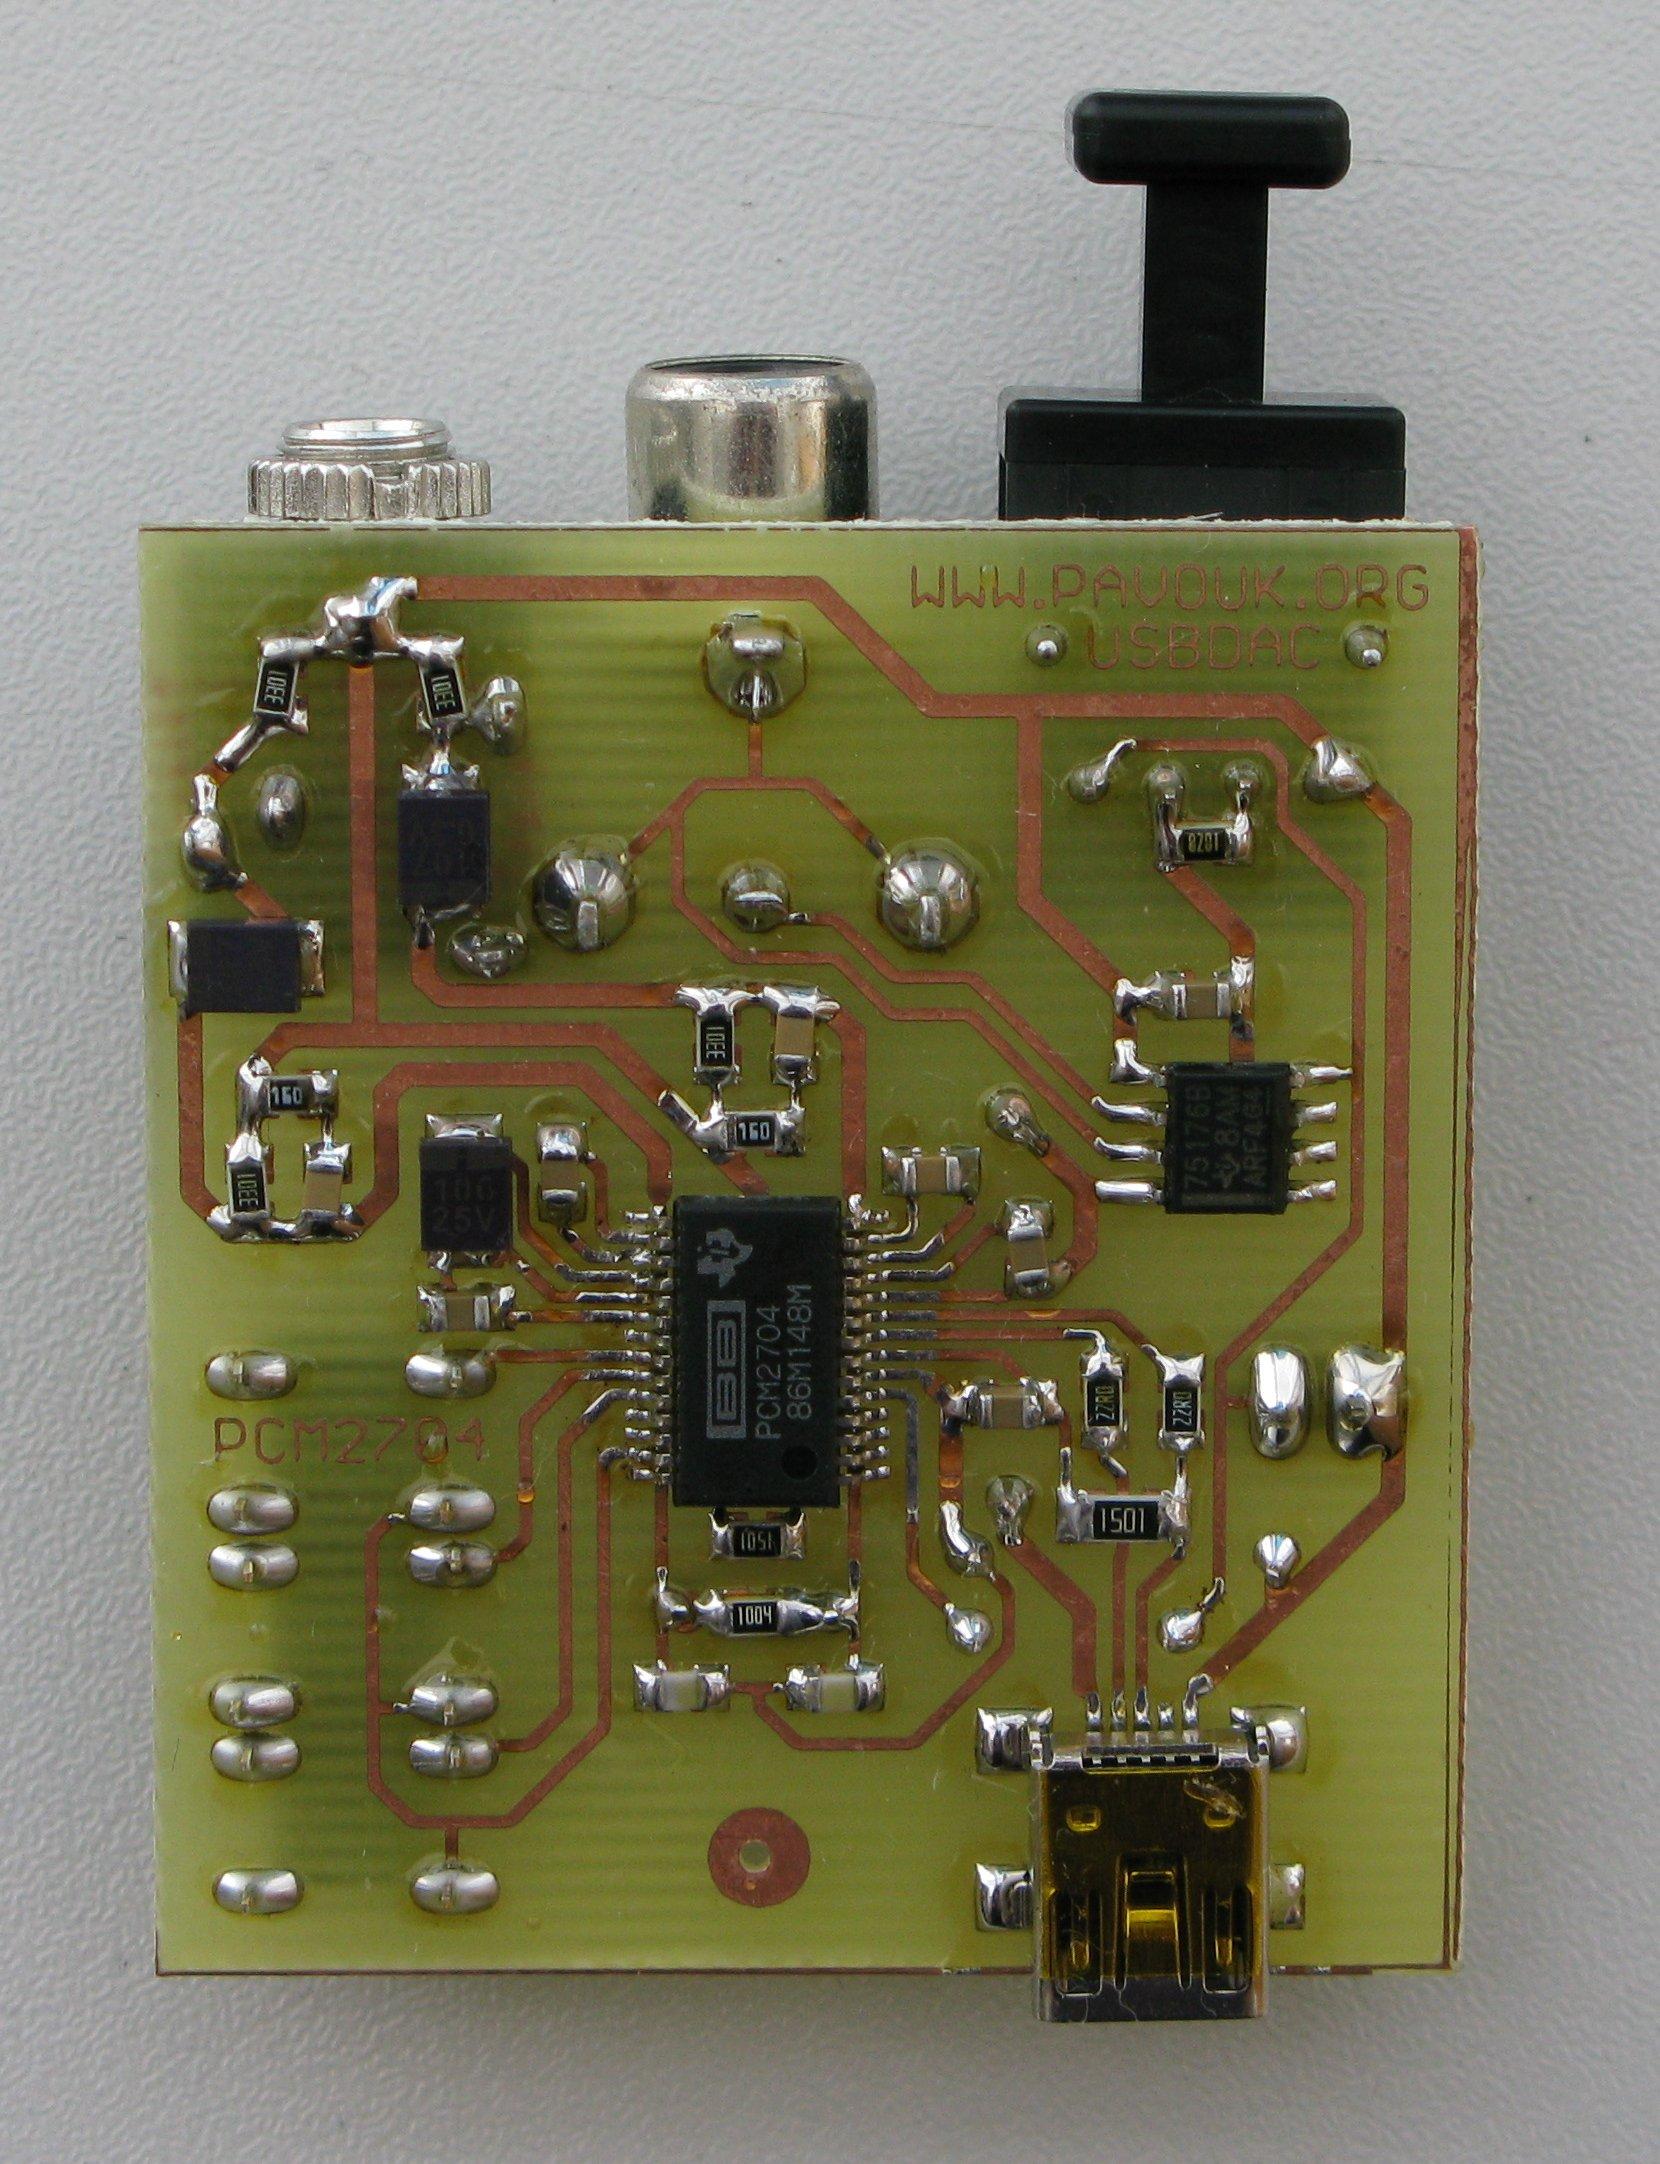 Strange Usb Audio Dac With Pcm2704 Wiring Cloud Faunaidewilluminateatxorg